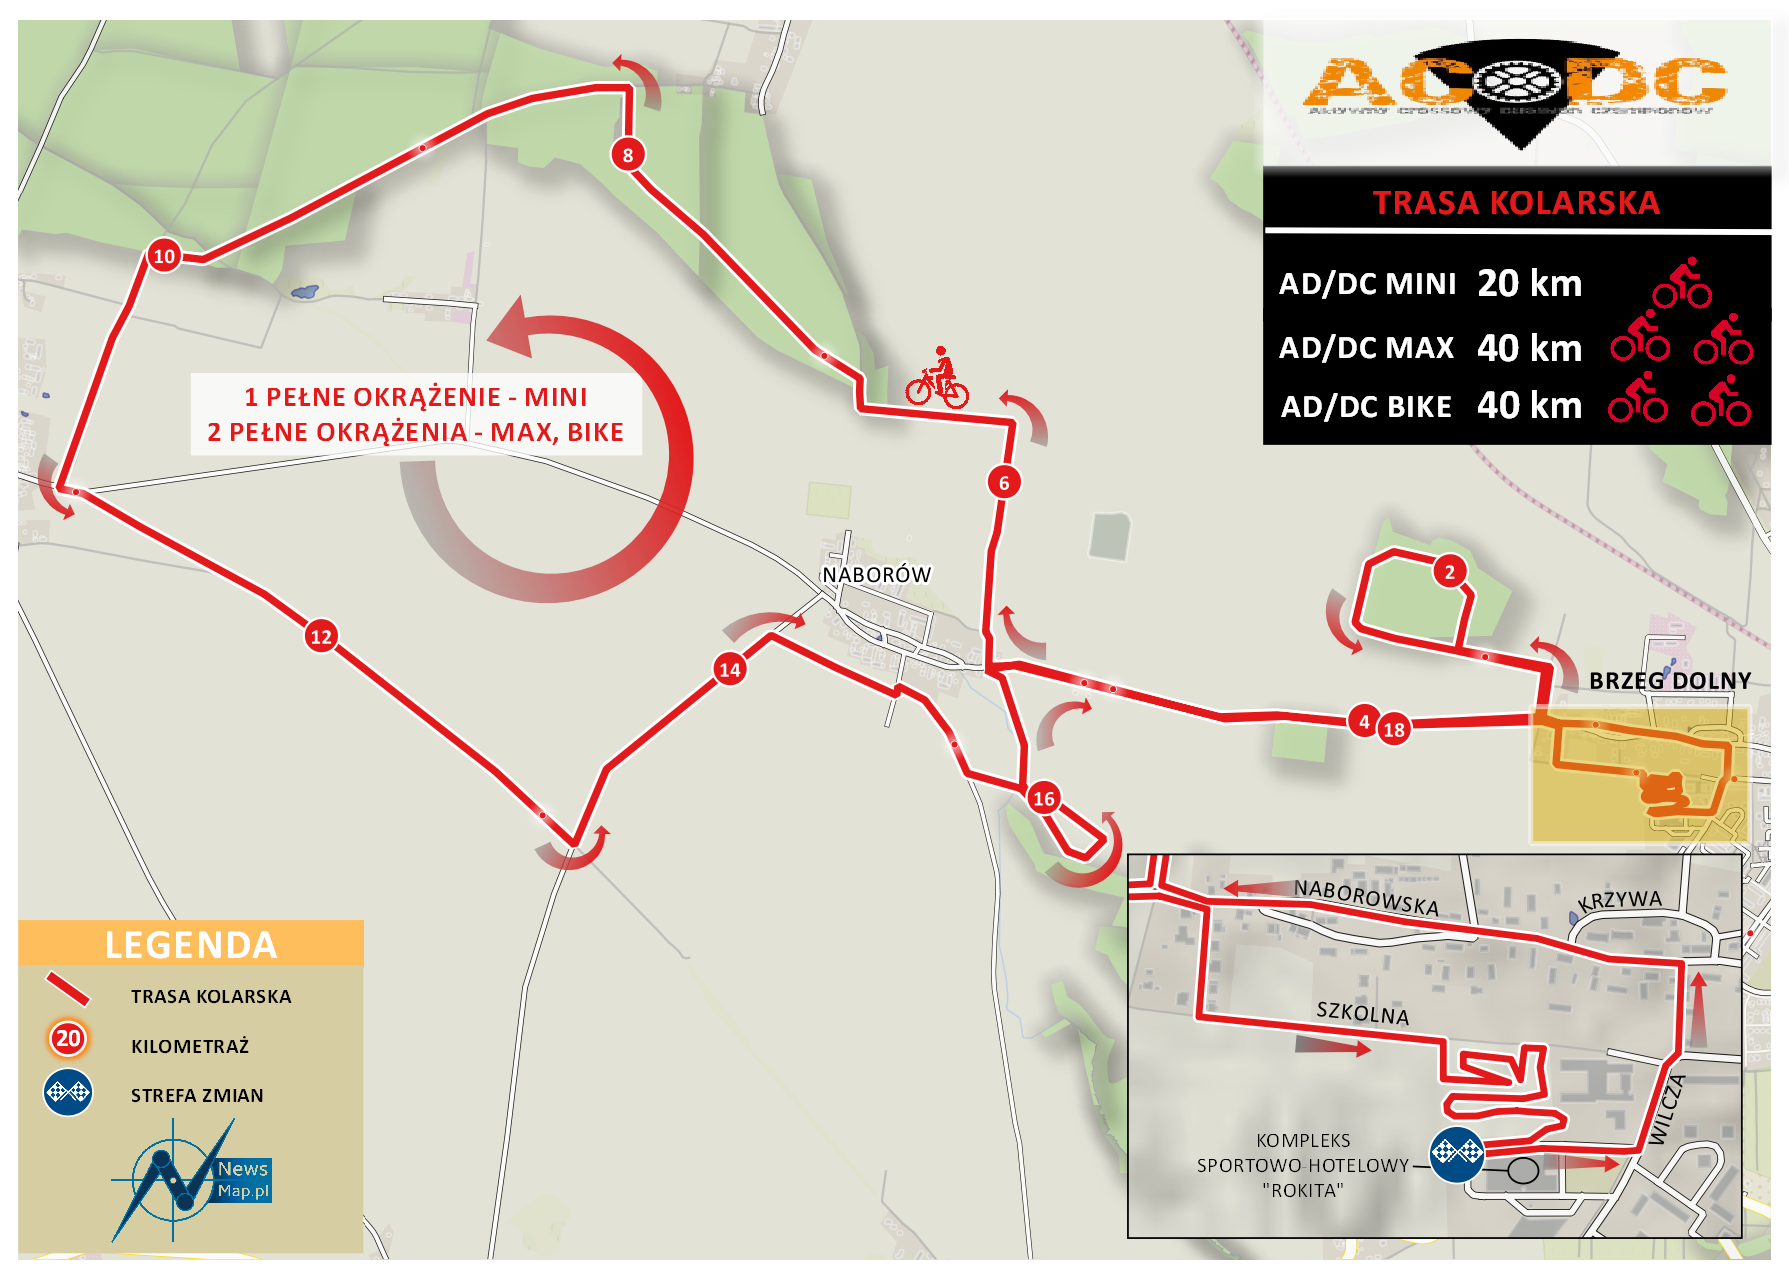 Duathlon AD;DC - trasa kolarska (mapa on-line)